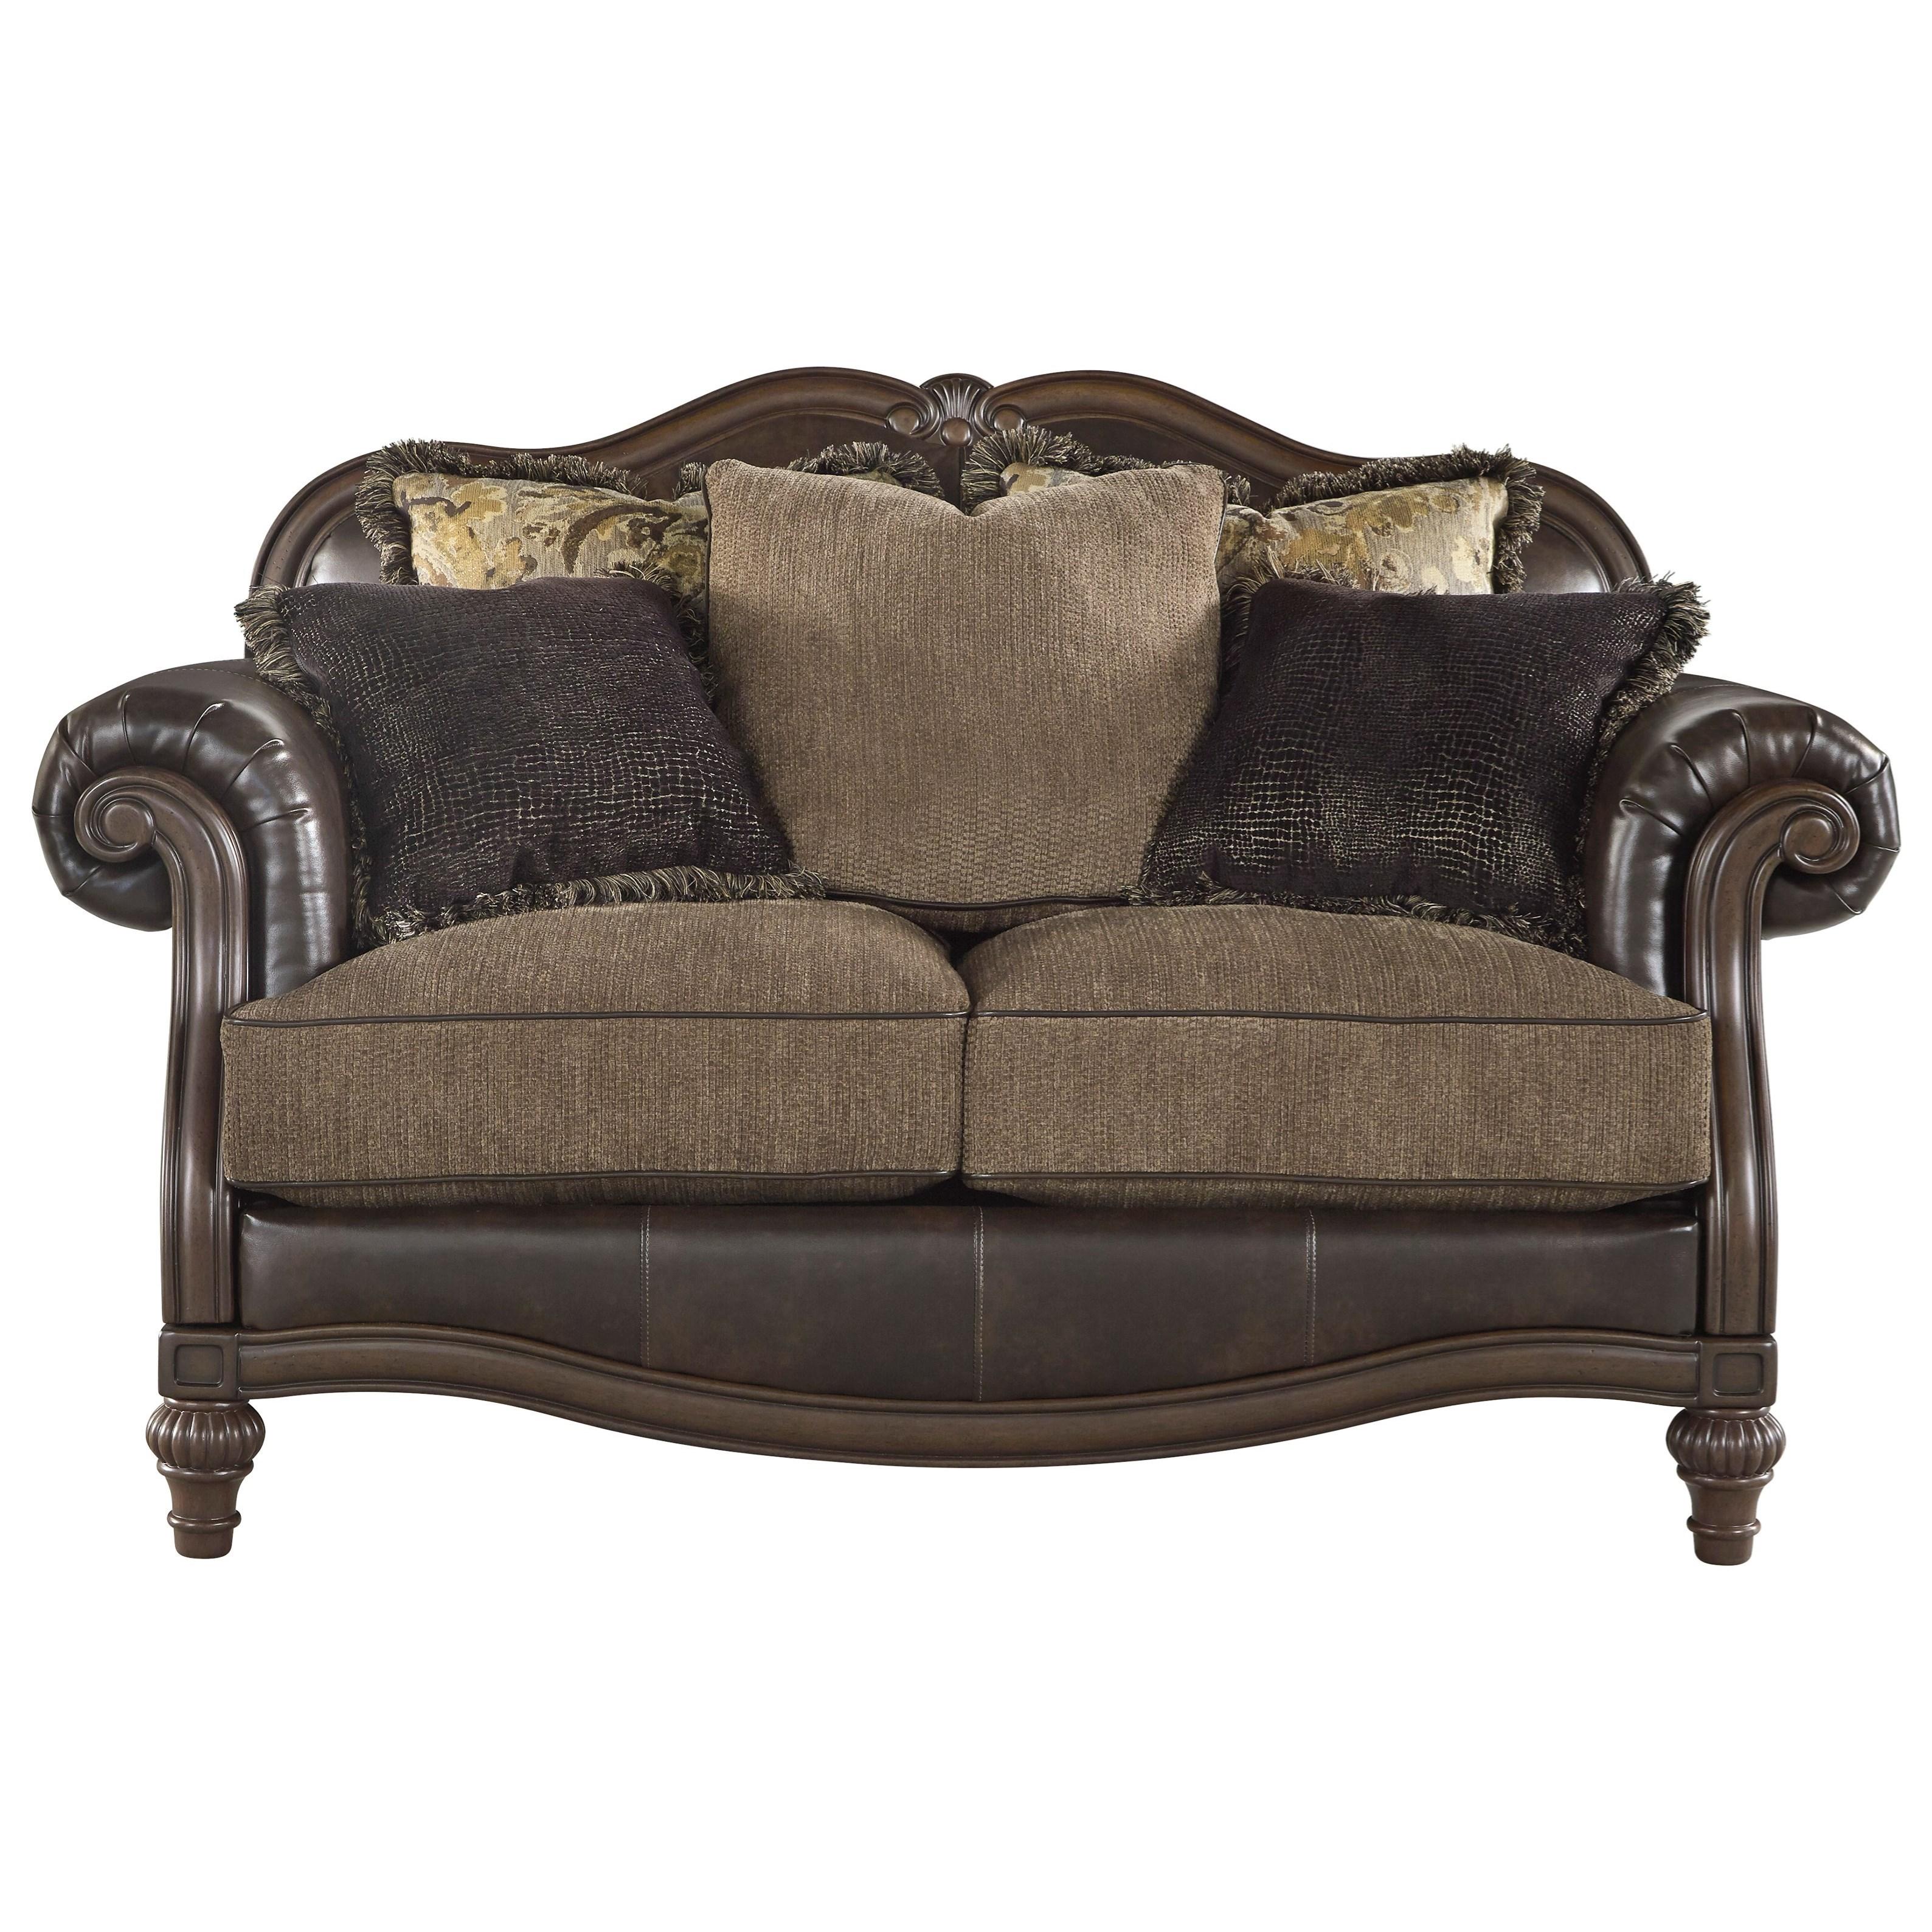 Ashley Signature Design Winnsboro Durablend 5560235 Traditional Fabric Bonded Leather Match